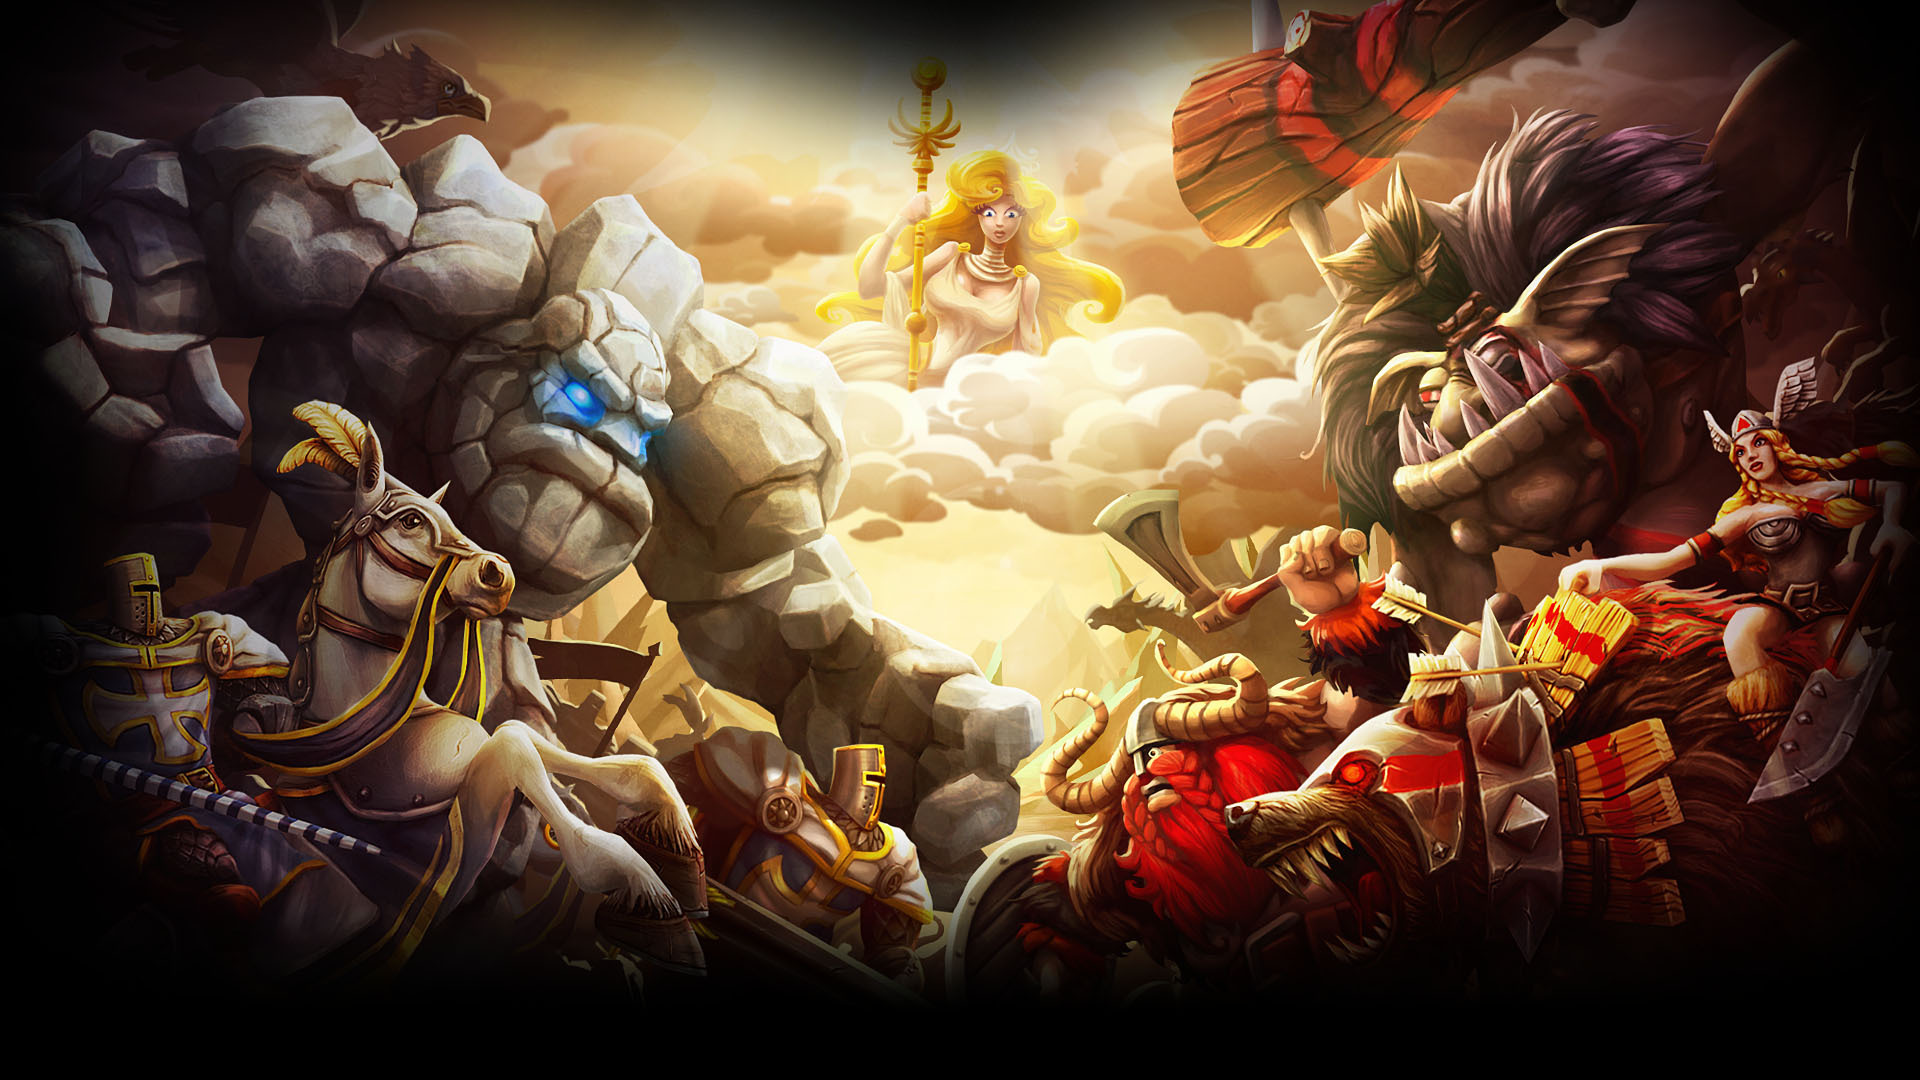 Knights vs. Vikings - Steam Companion